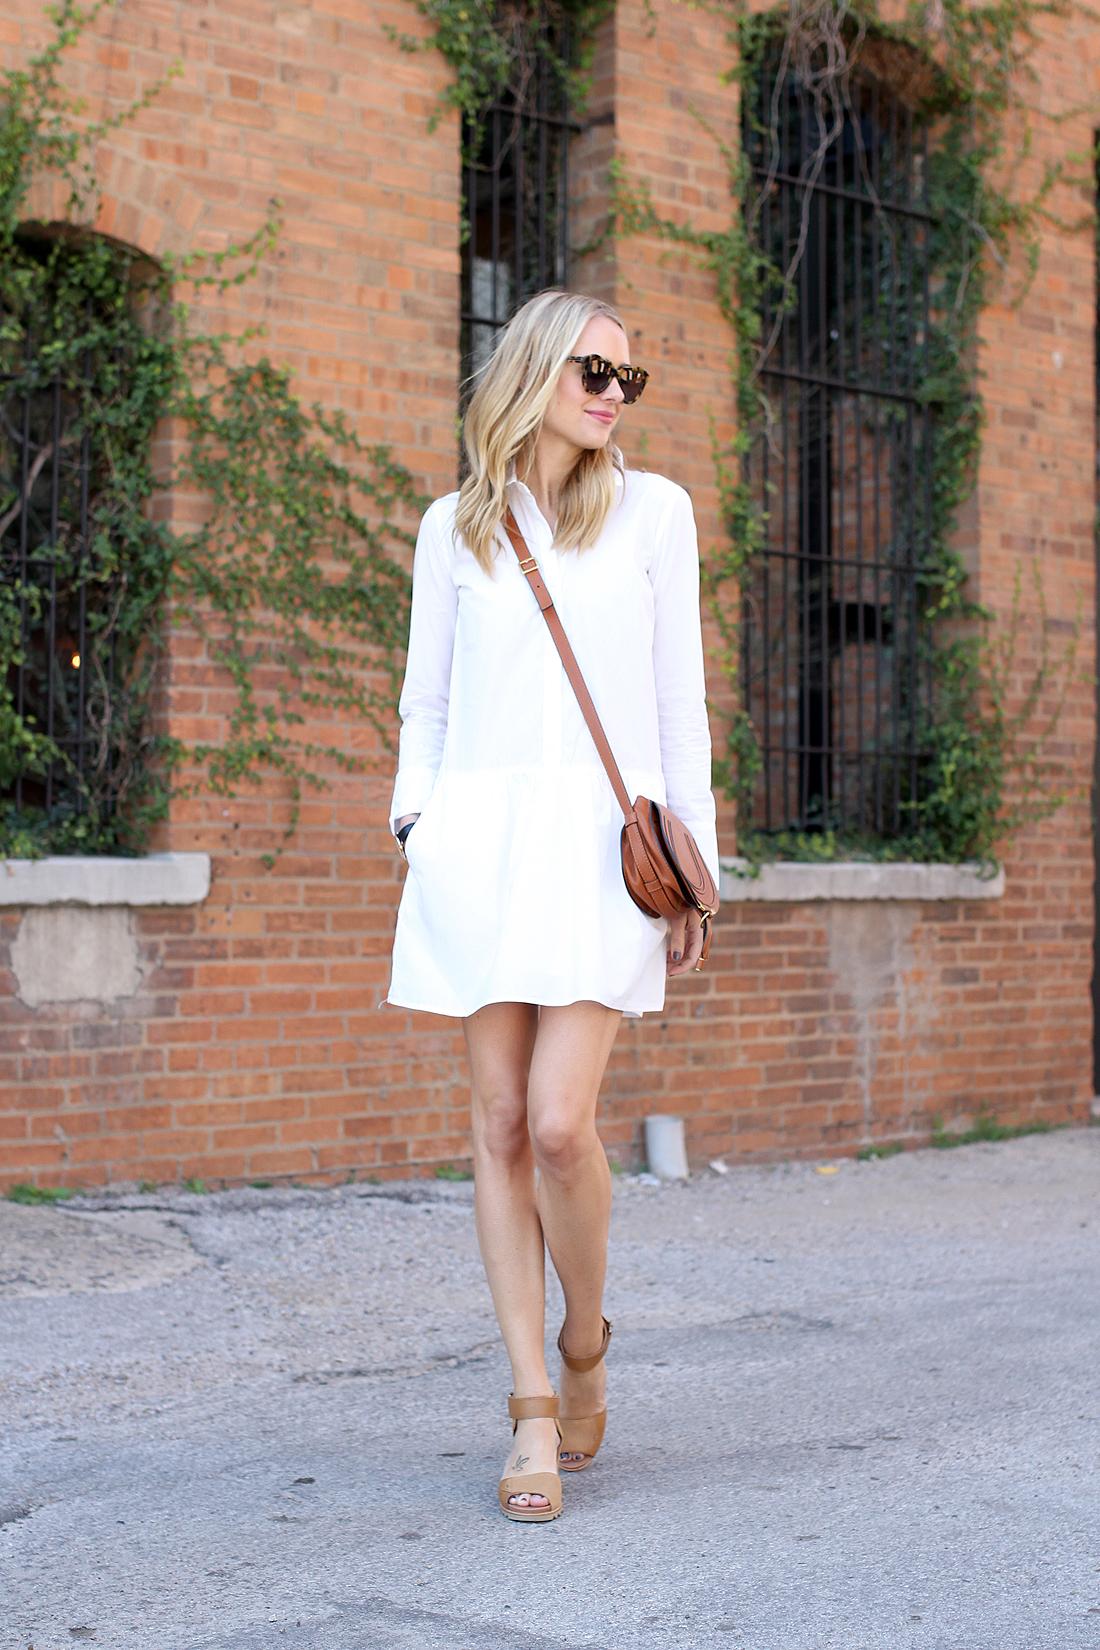 fashion-jackson-splendid-damsel-white-shirt-dress-karen-walker-sunglasses-sorel-joanie-sandals-chloe-marcie-tan-crossbody